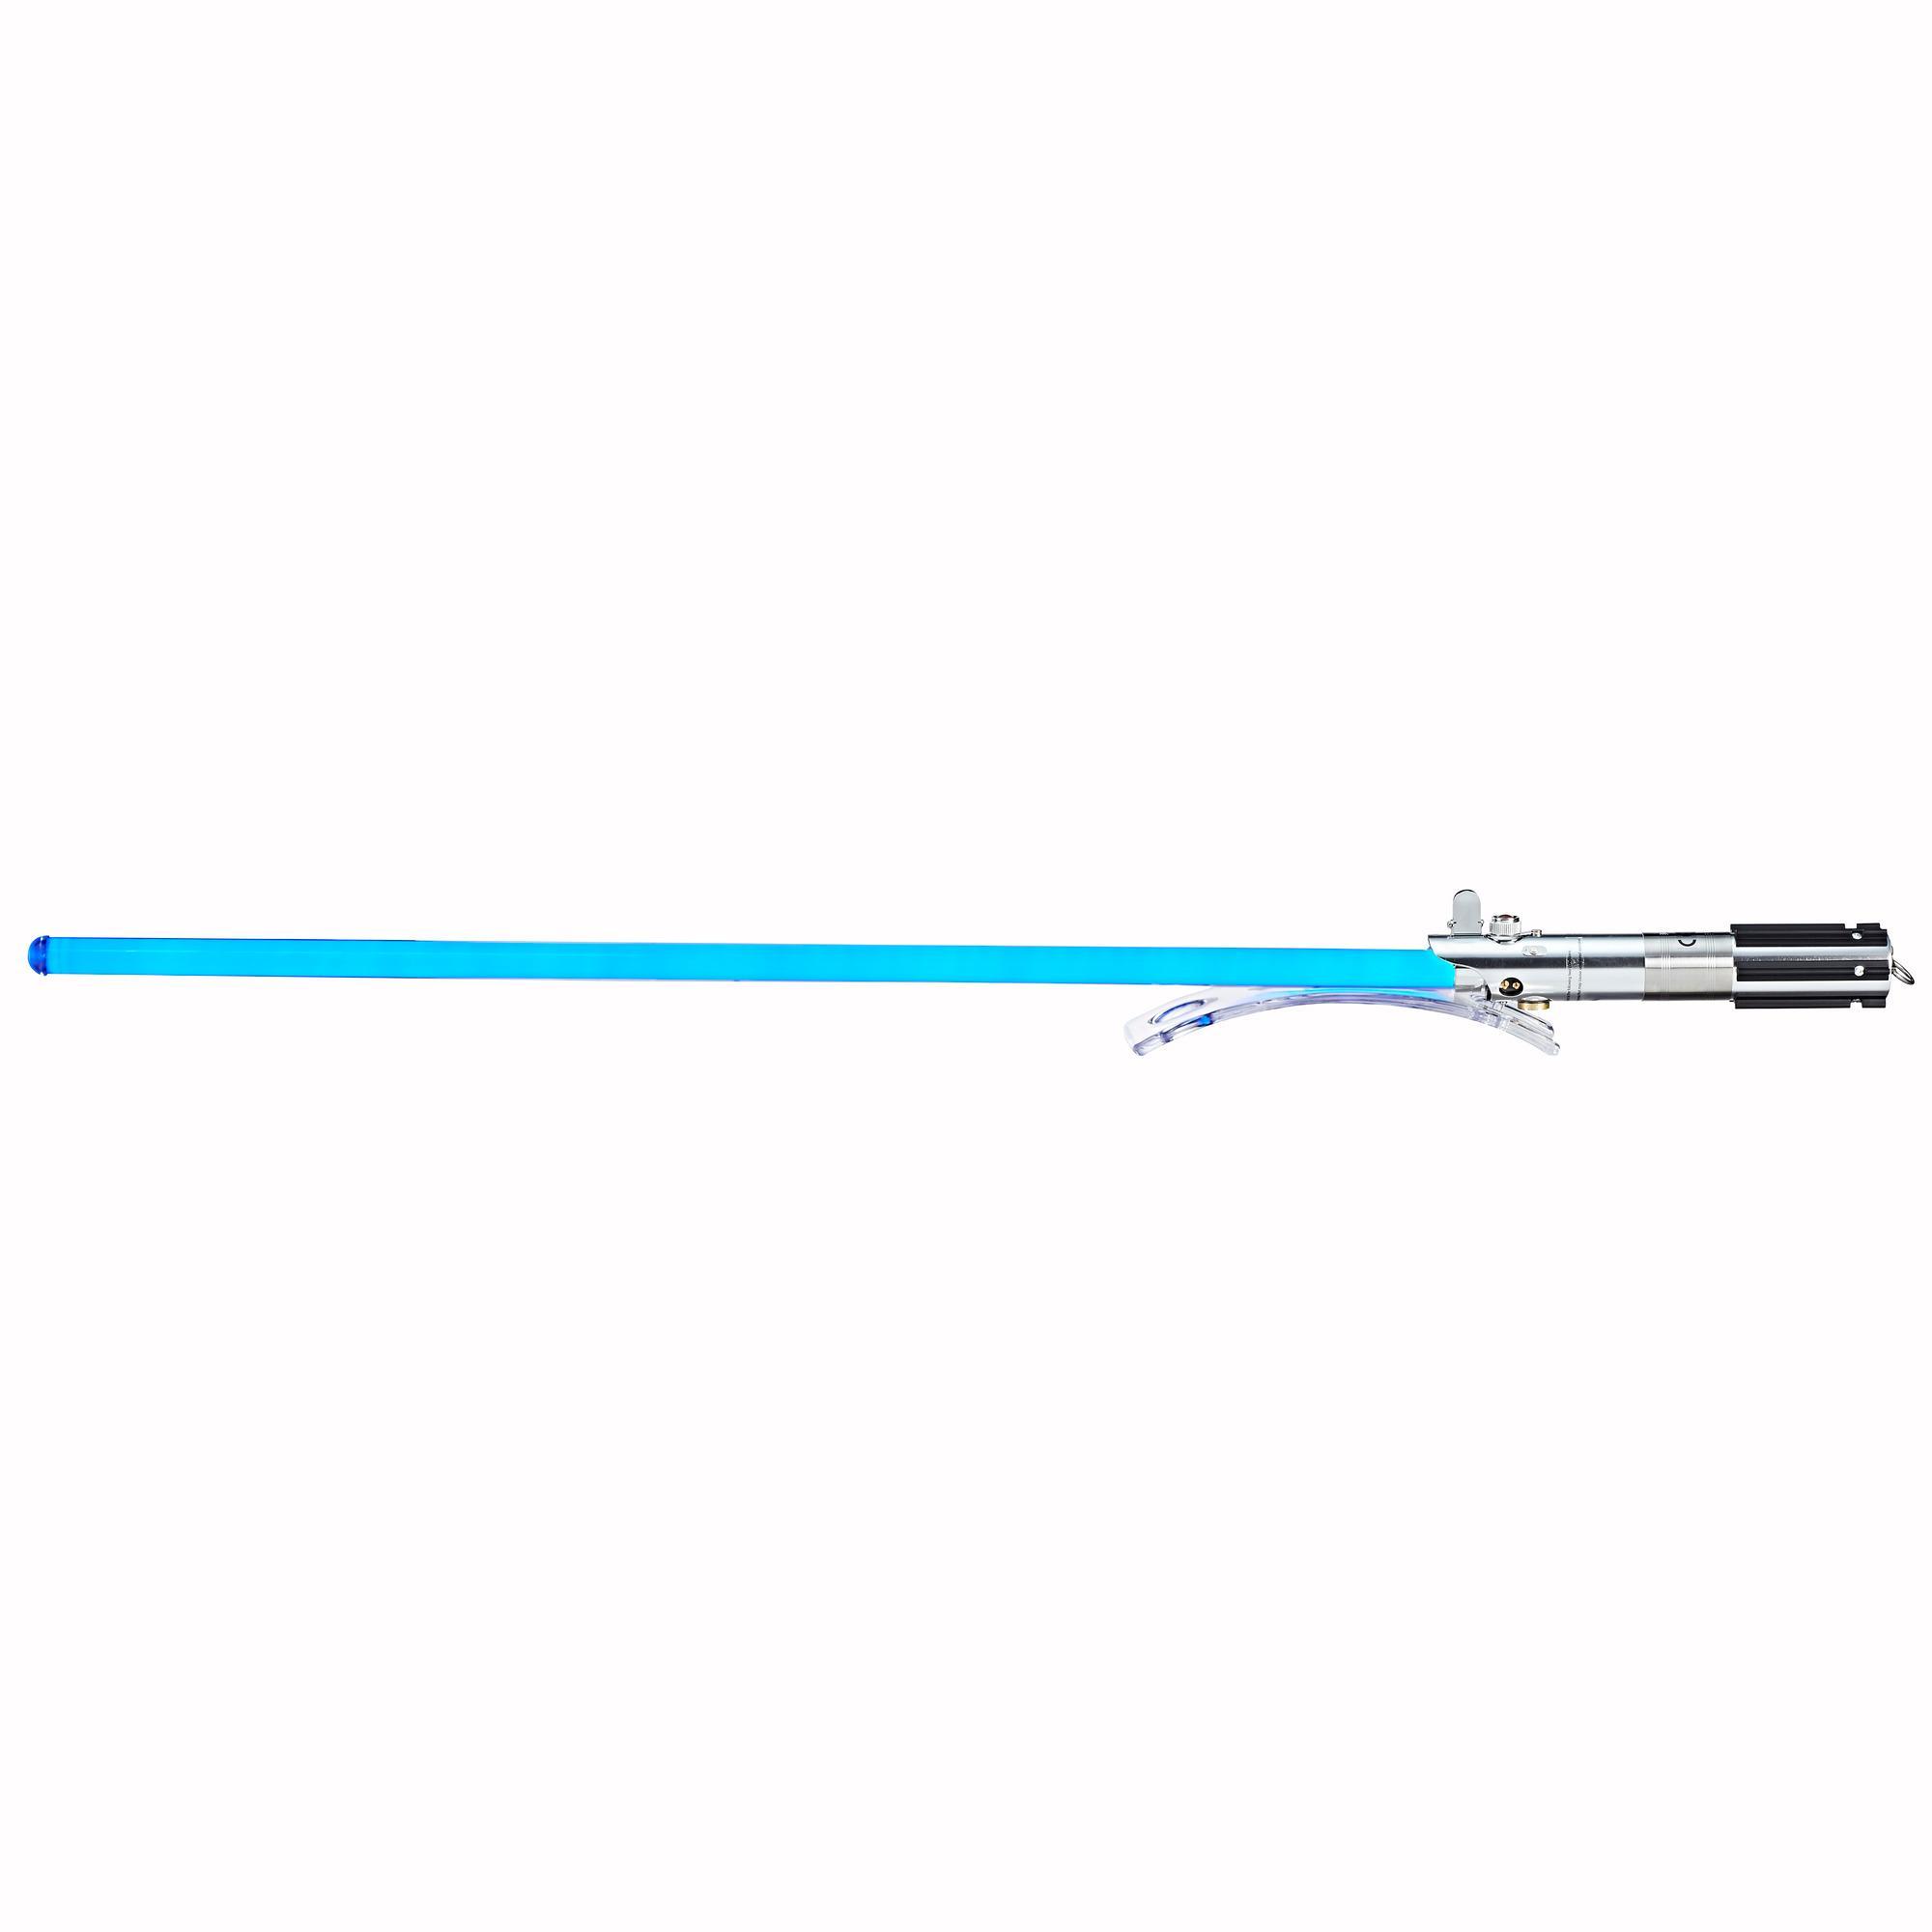 Star Wars: Os Últimos Jedi The Black Series - Sabre de luz Force FX de Rey (Treinamento Jedi)